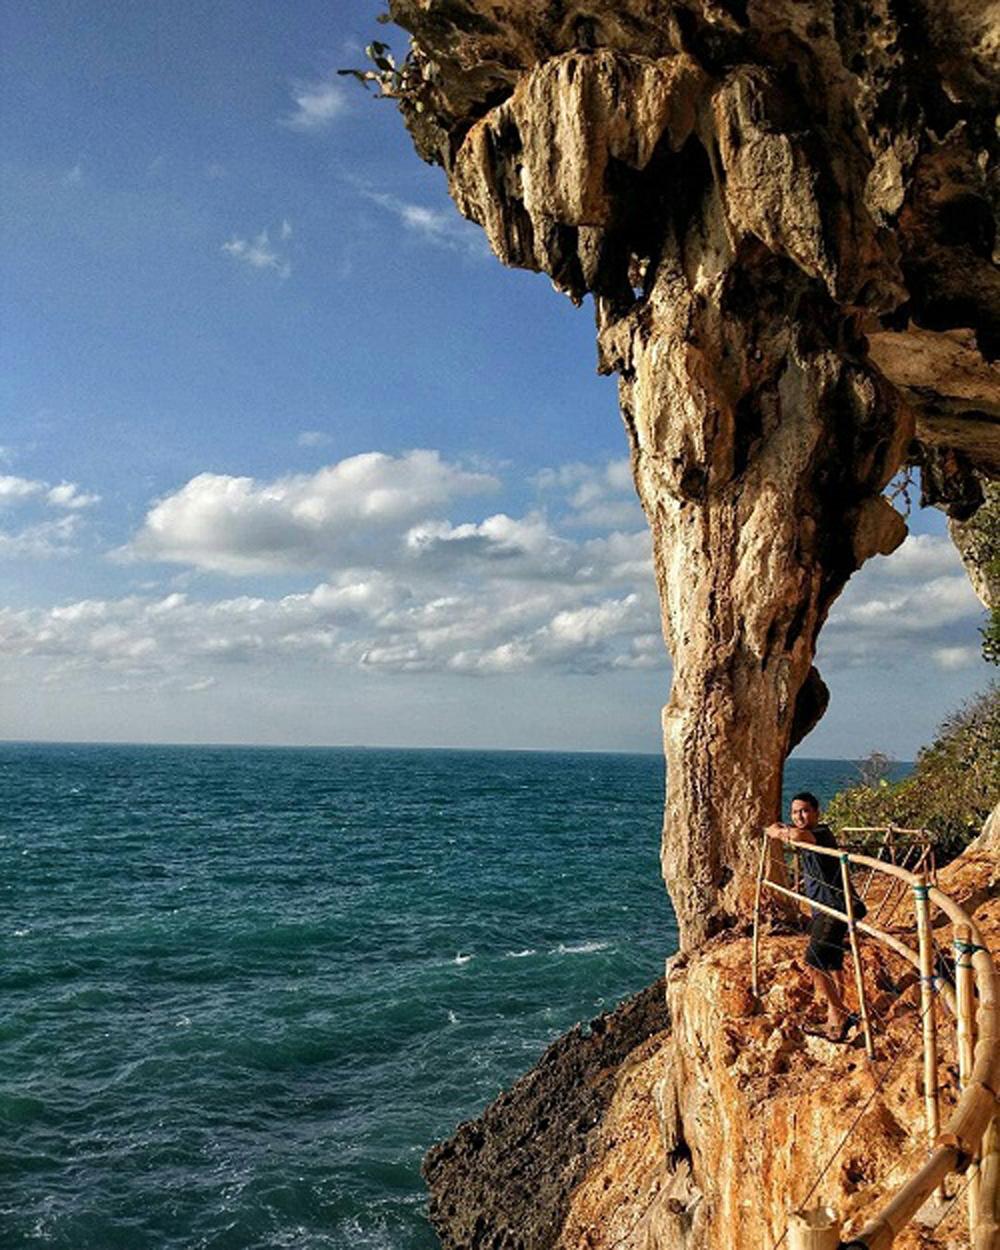 Pulau Awet Muda Sumenep Acehimagecom Photo Journalist Gili Iyang Wisatawan